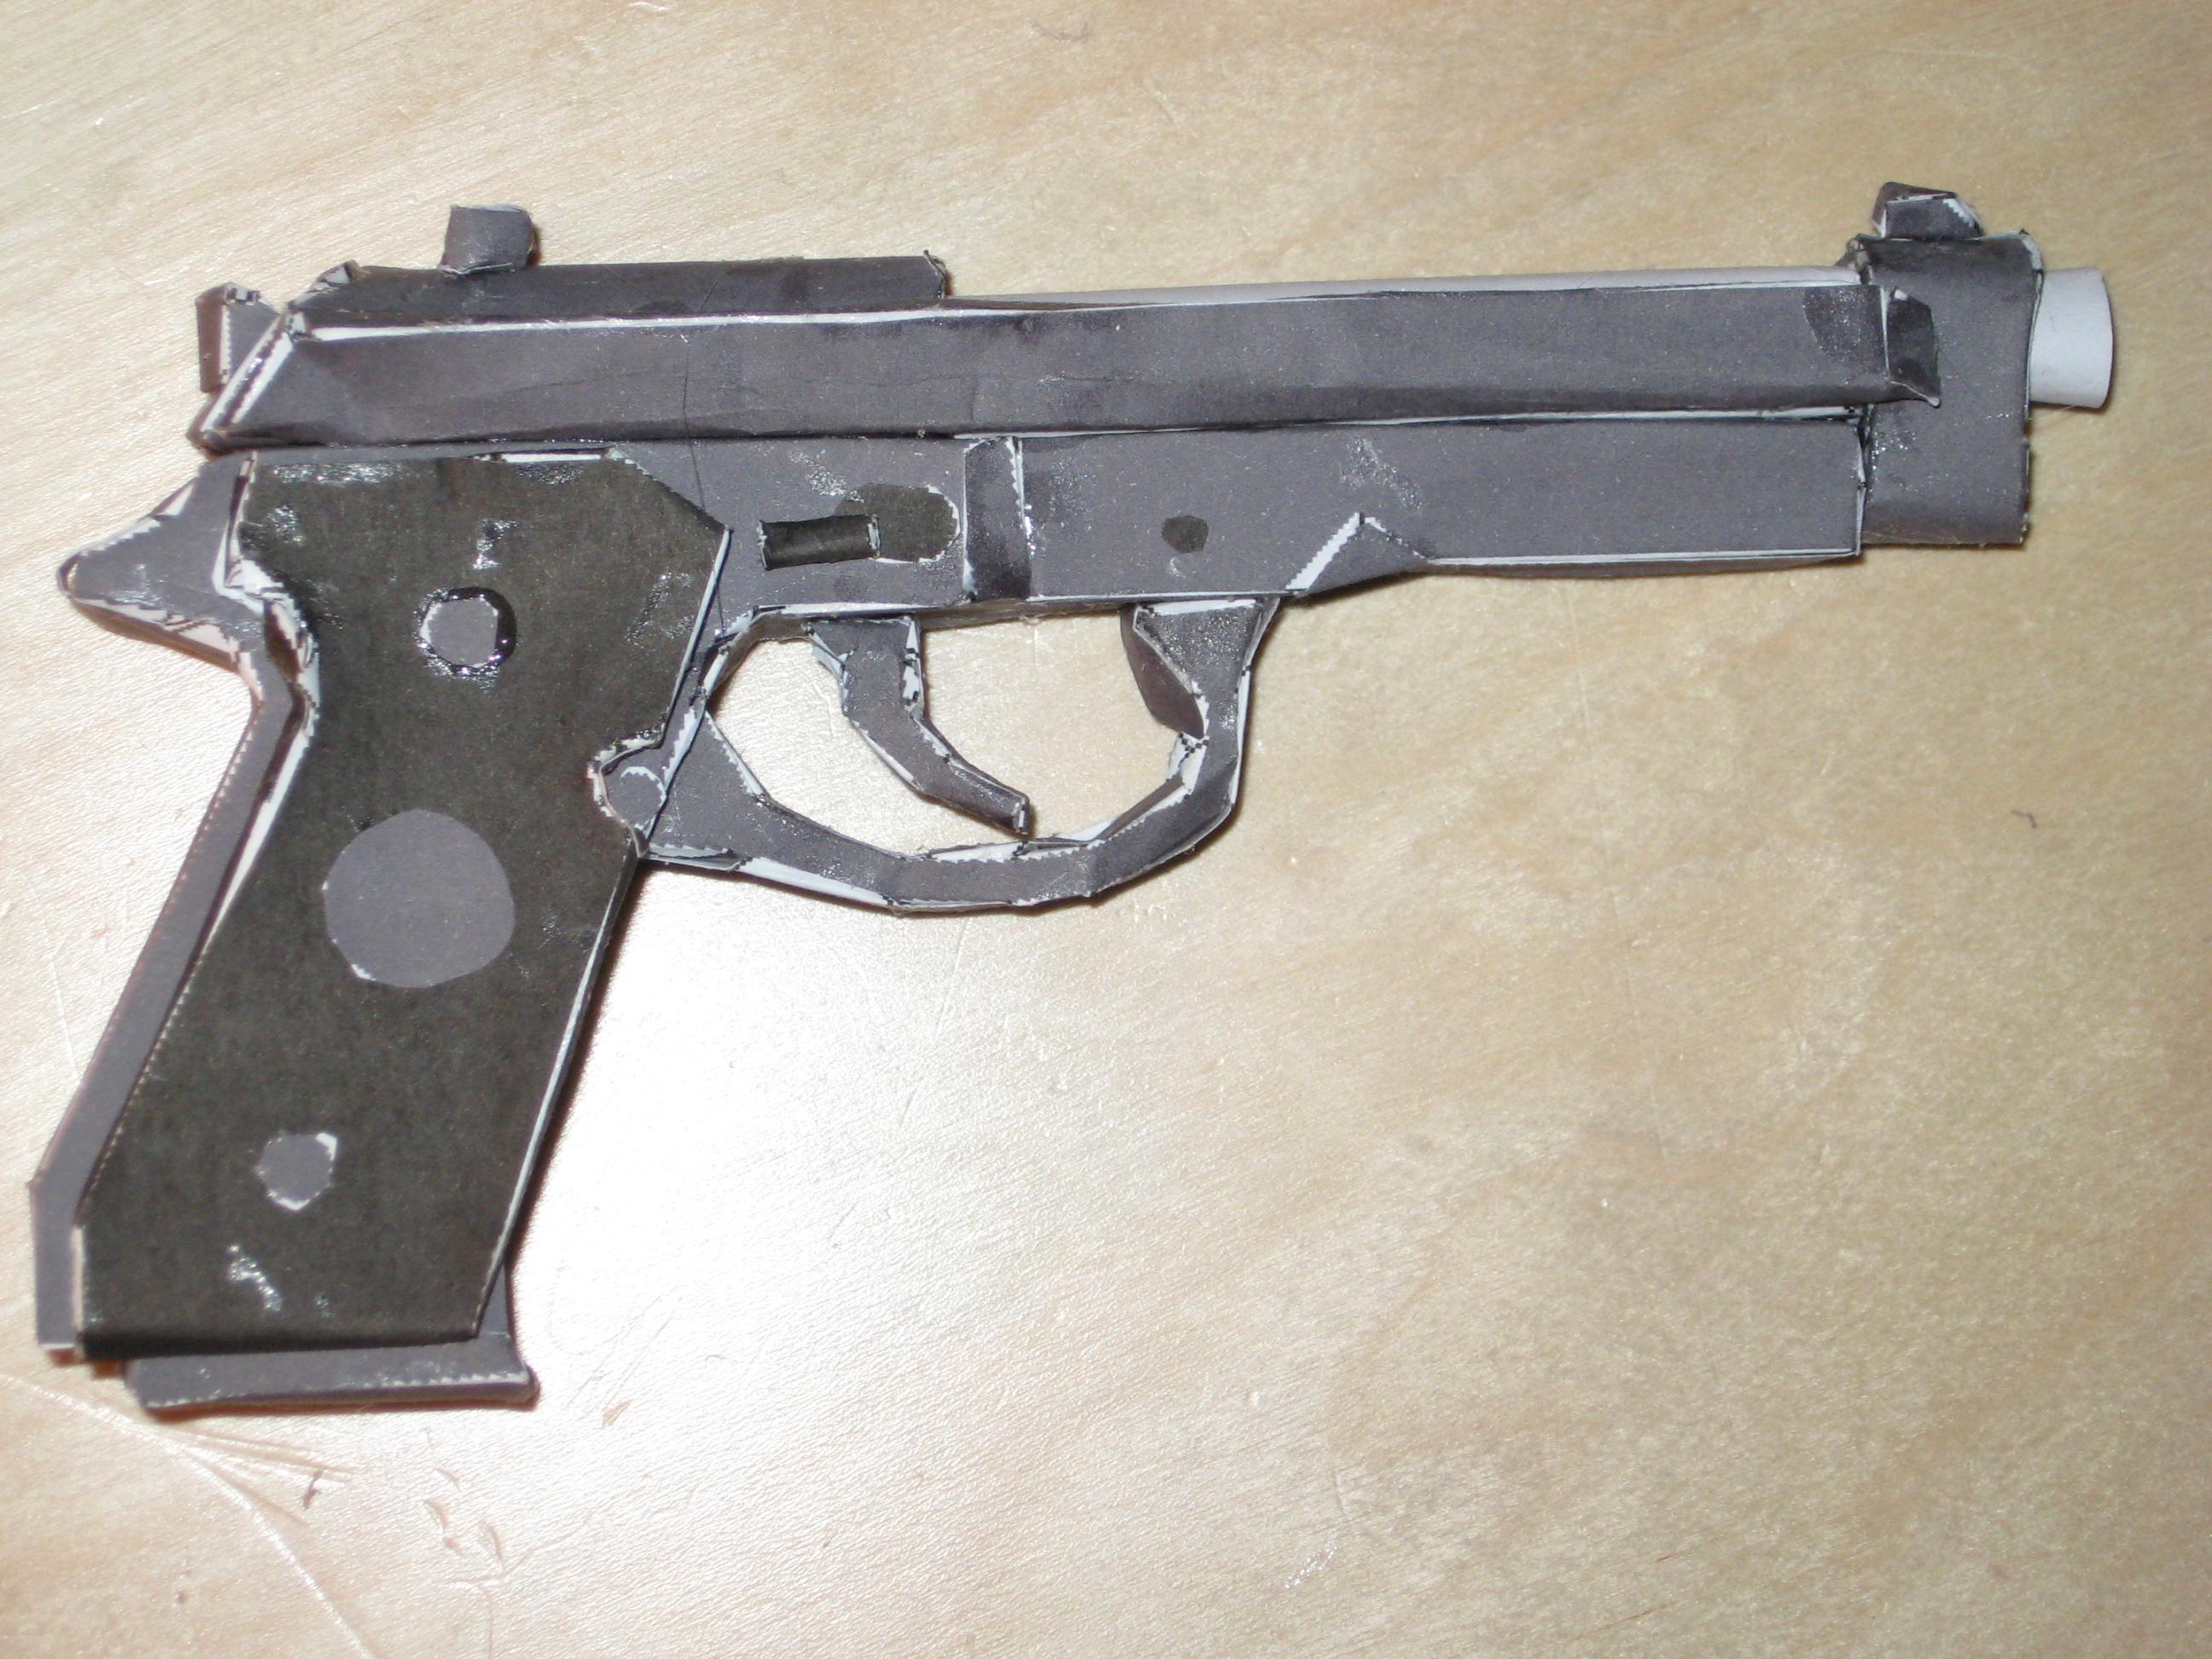 How to make a paper model gun!